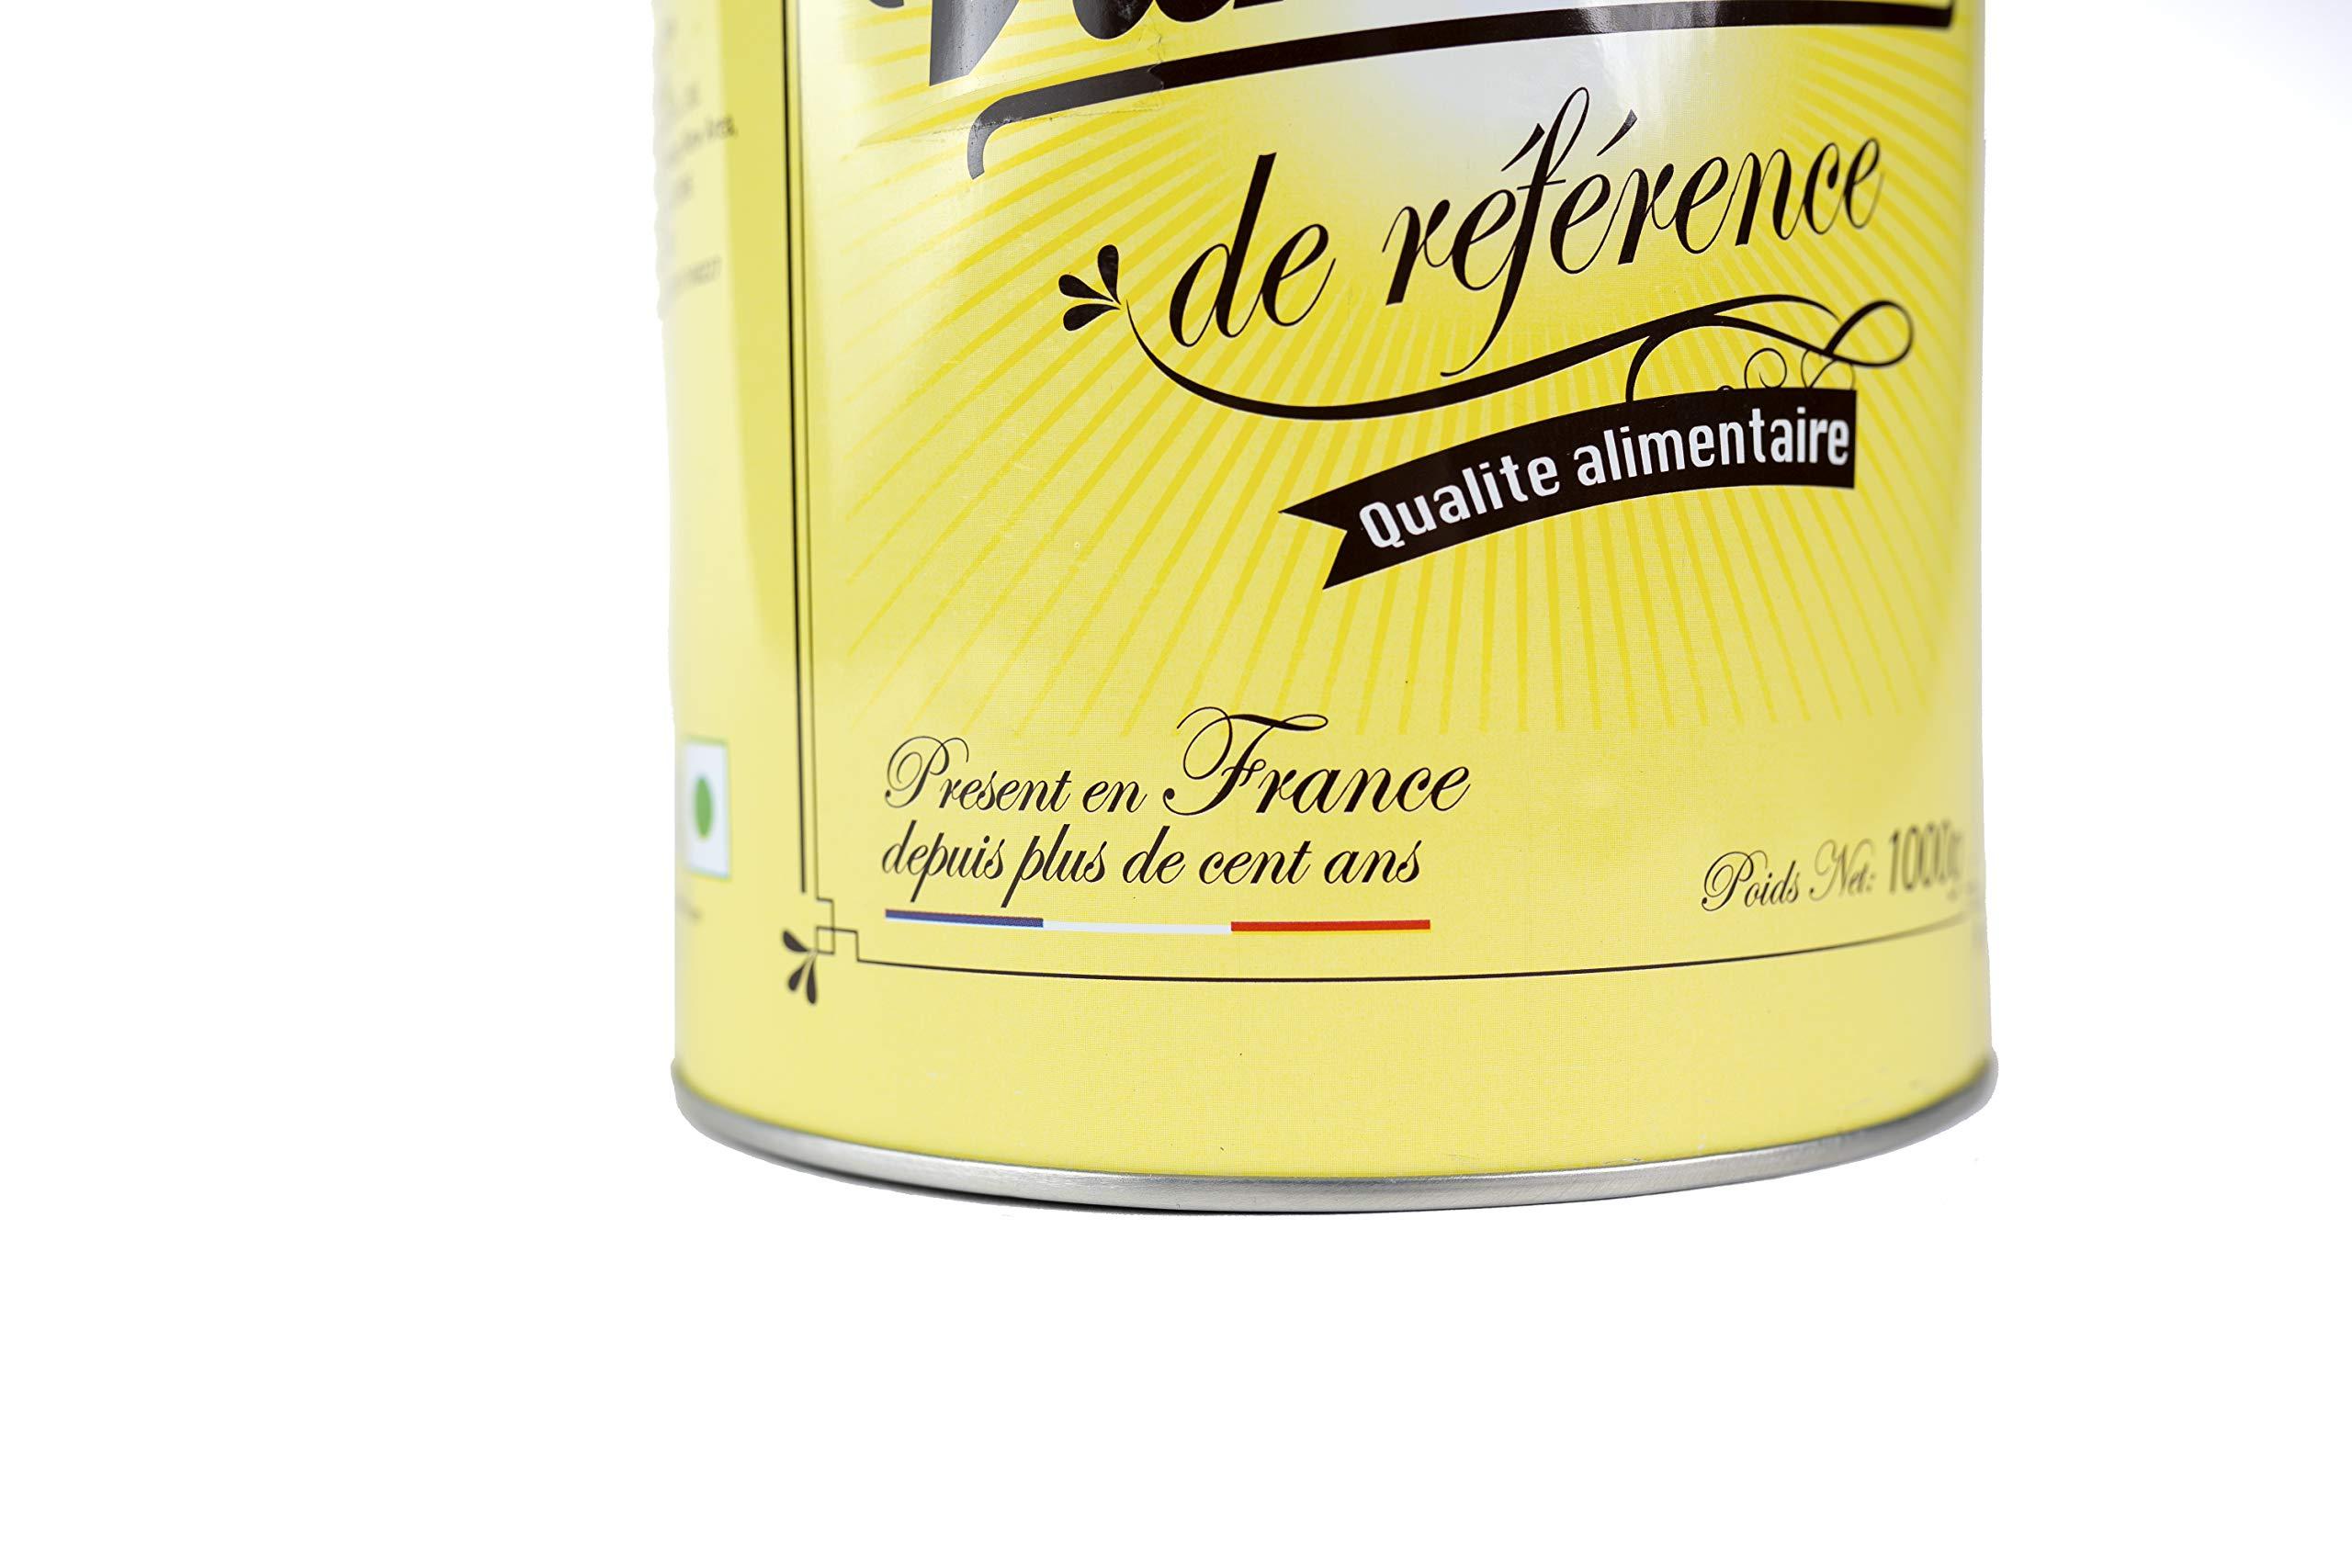 Vanillin Powder Rhovanil 1kg by Solvay Rhovanil Vanillin (Image #5)